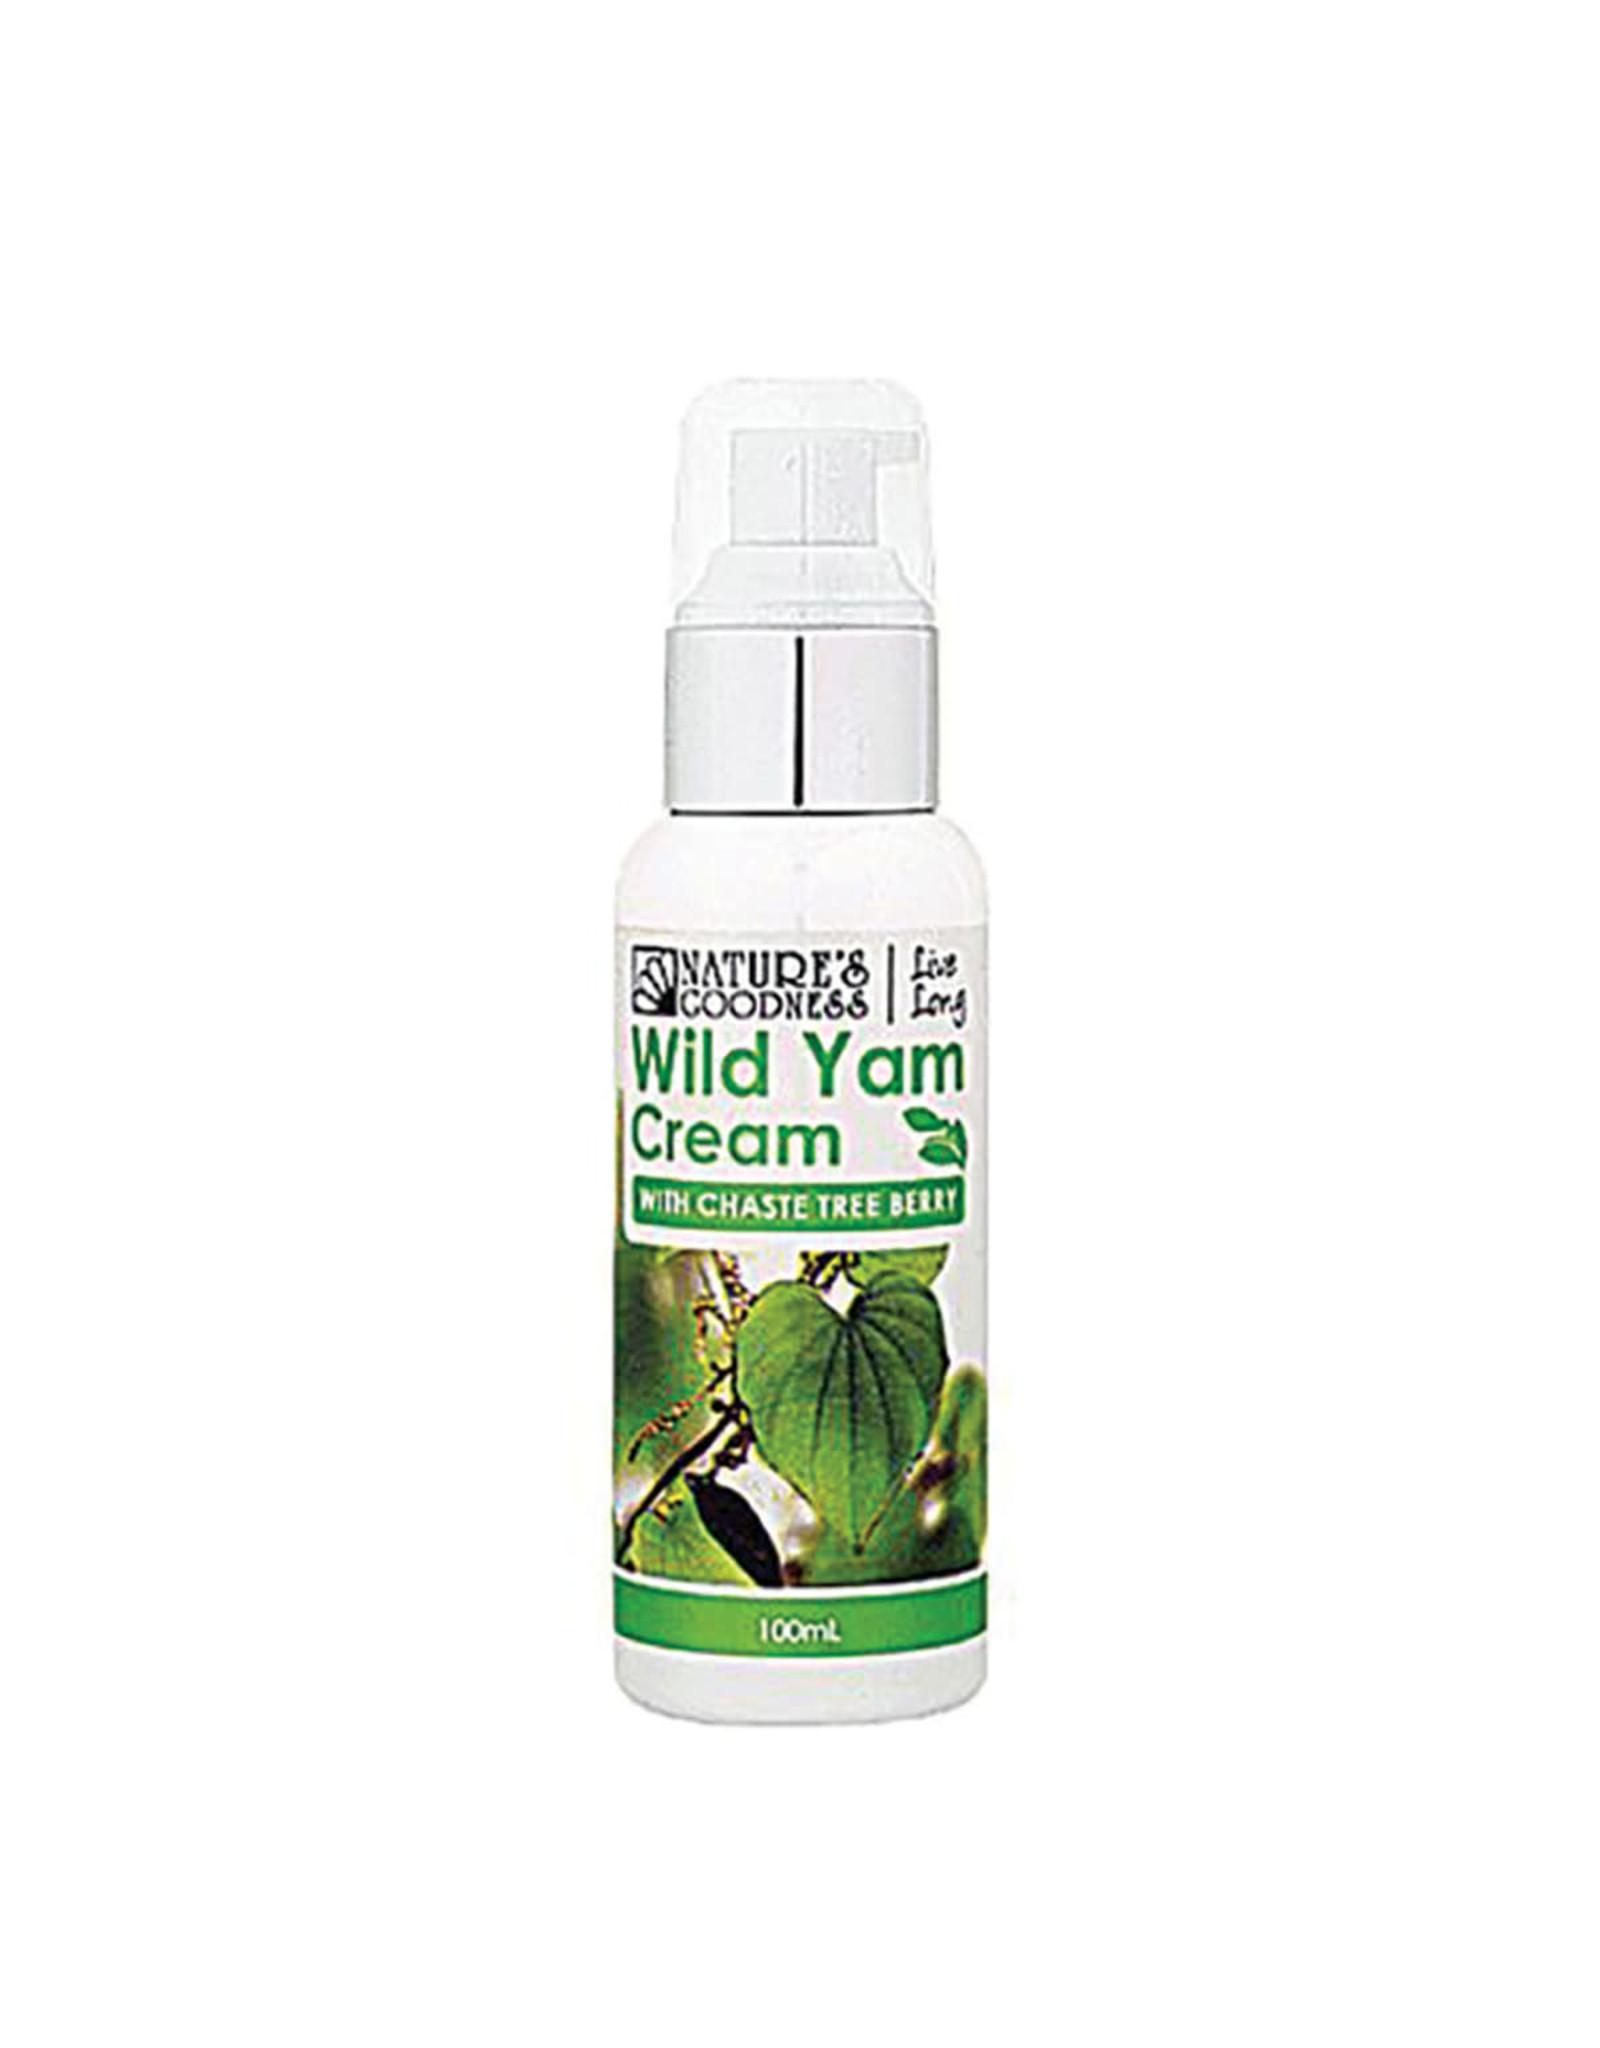 Nature's Goodness Wild Yam Cream (with Chaste Tree Berry) 100ml